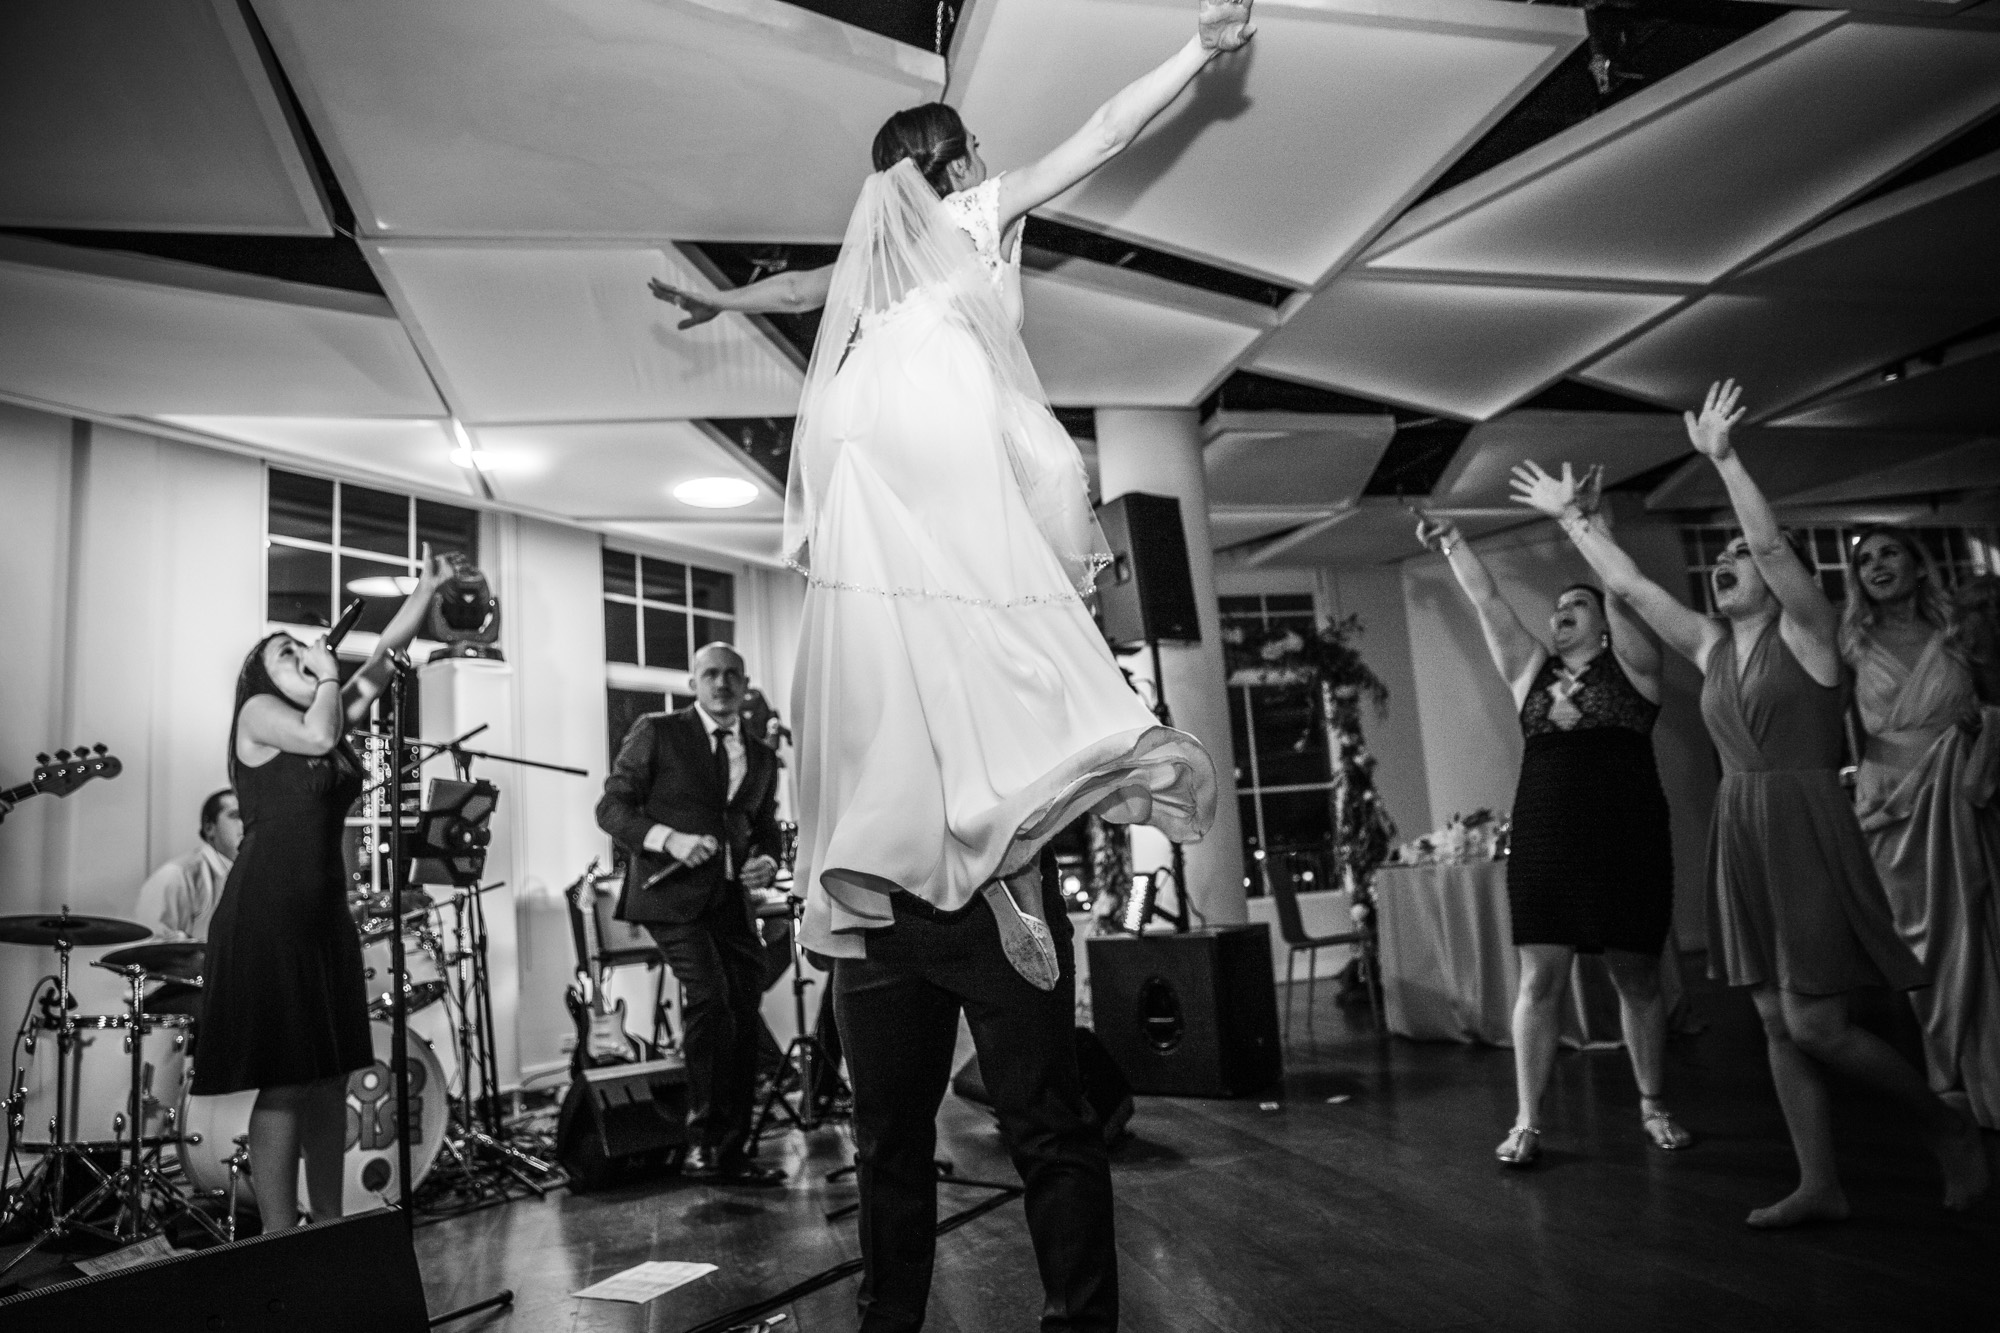 nj-wedding-photographer-maritime-parc-maria-david-61.jpg